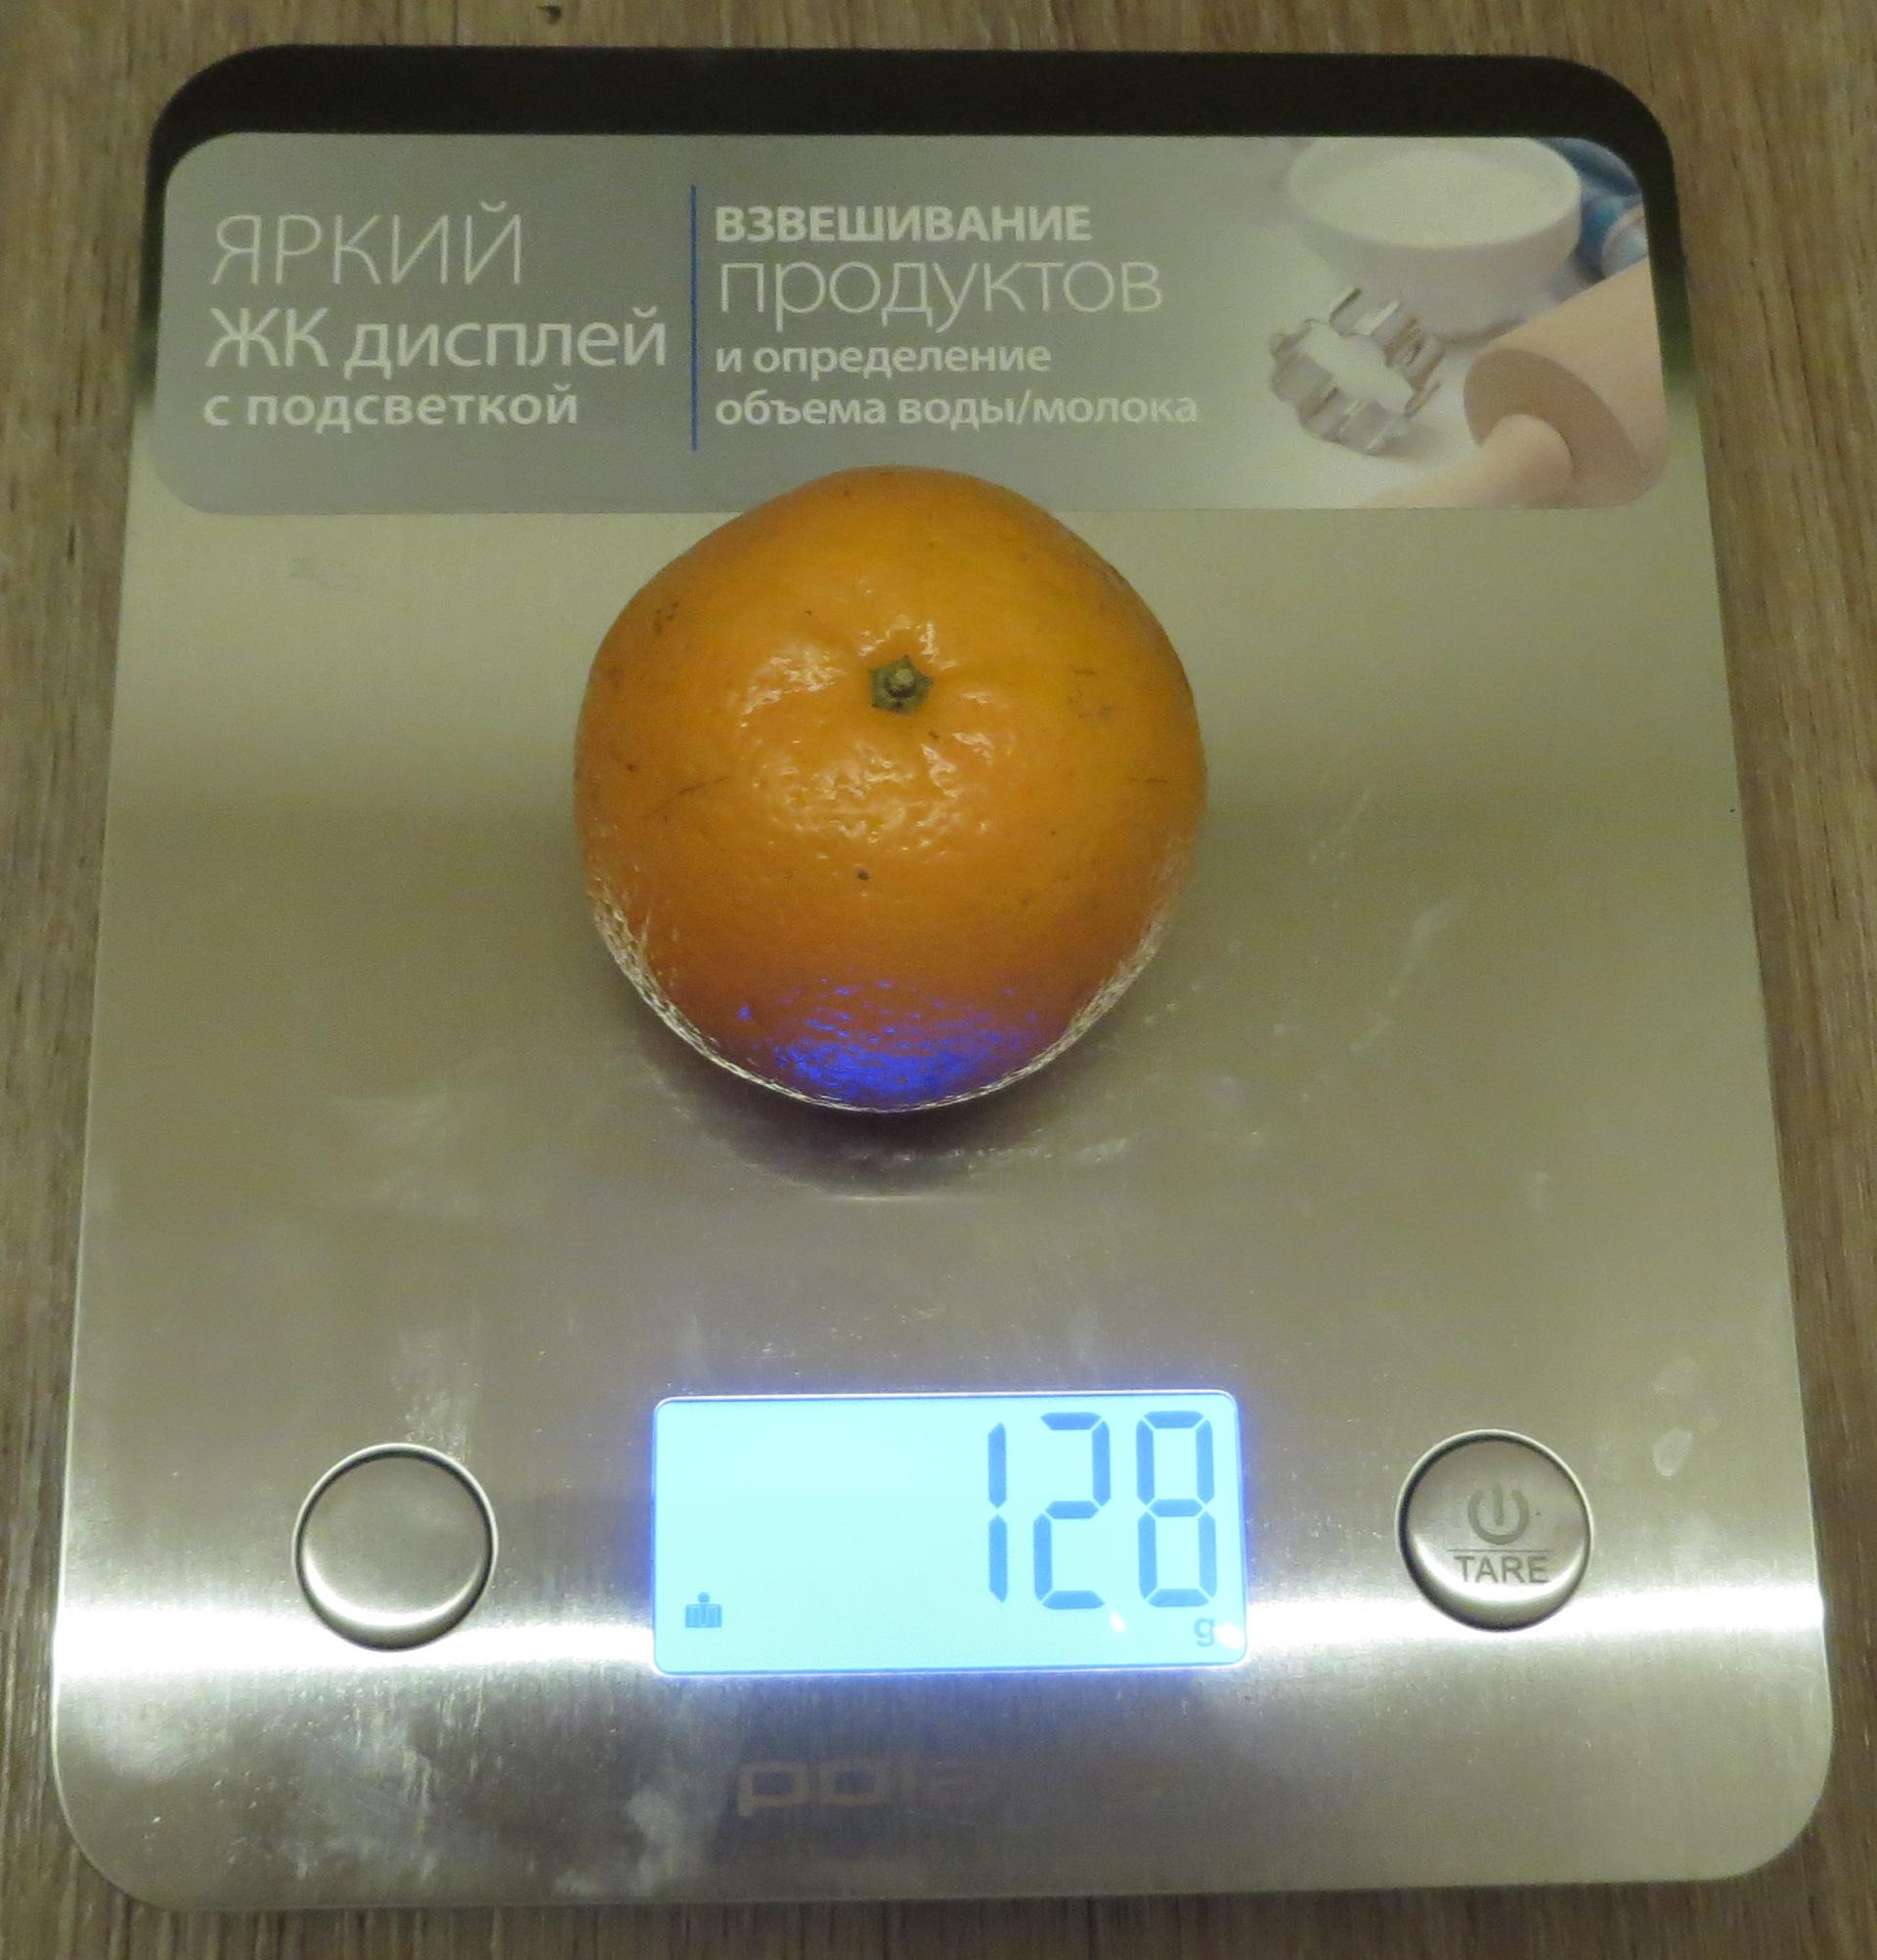 Весы polaris PKS 0547DM